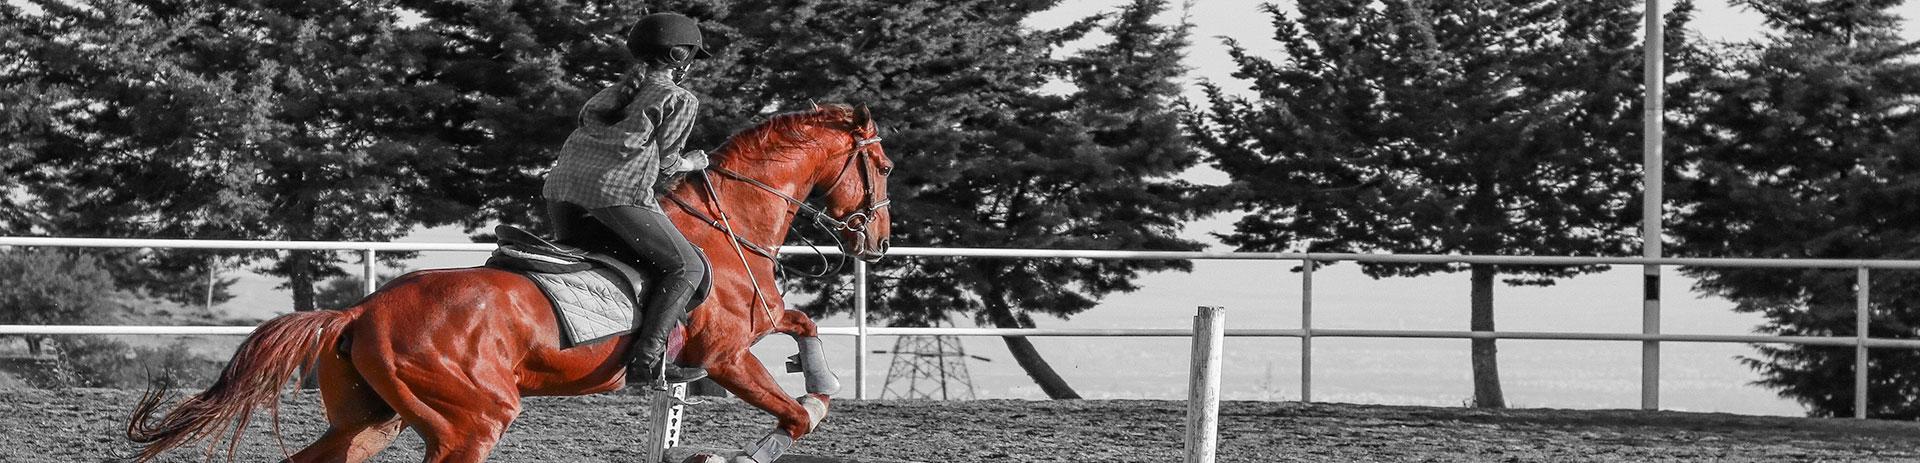 letselschade verhalen na ongeval met paard